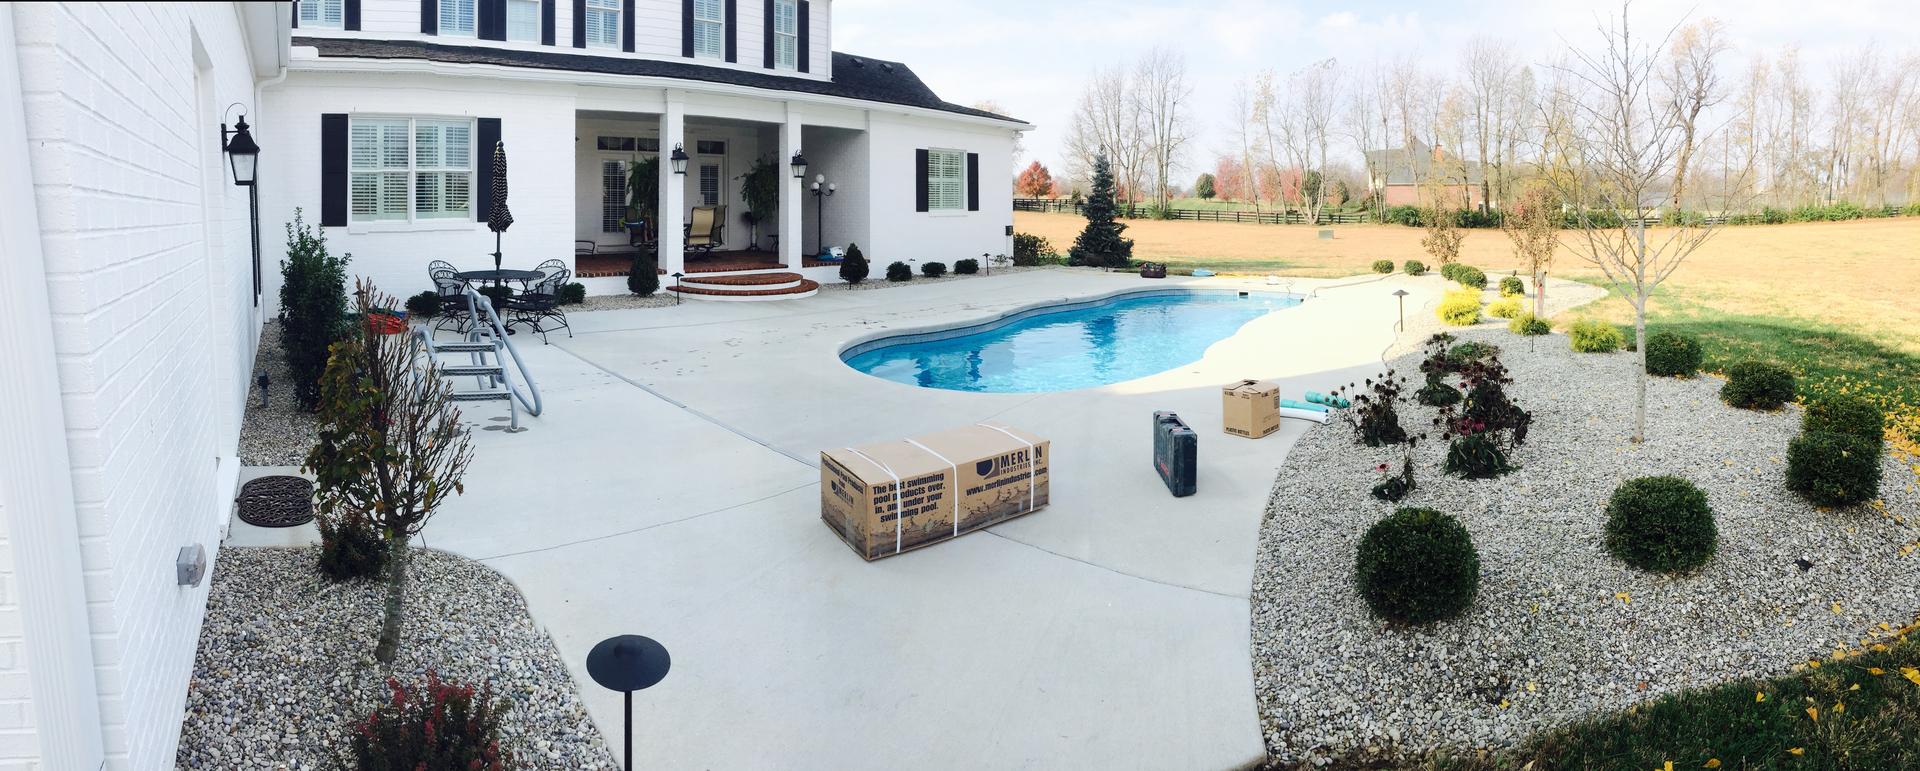 Backyard Fun Pools Inc Nicholasville Kentucky Ky